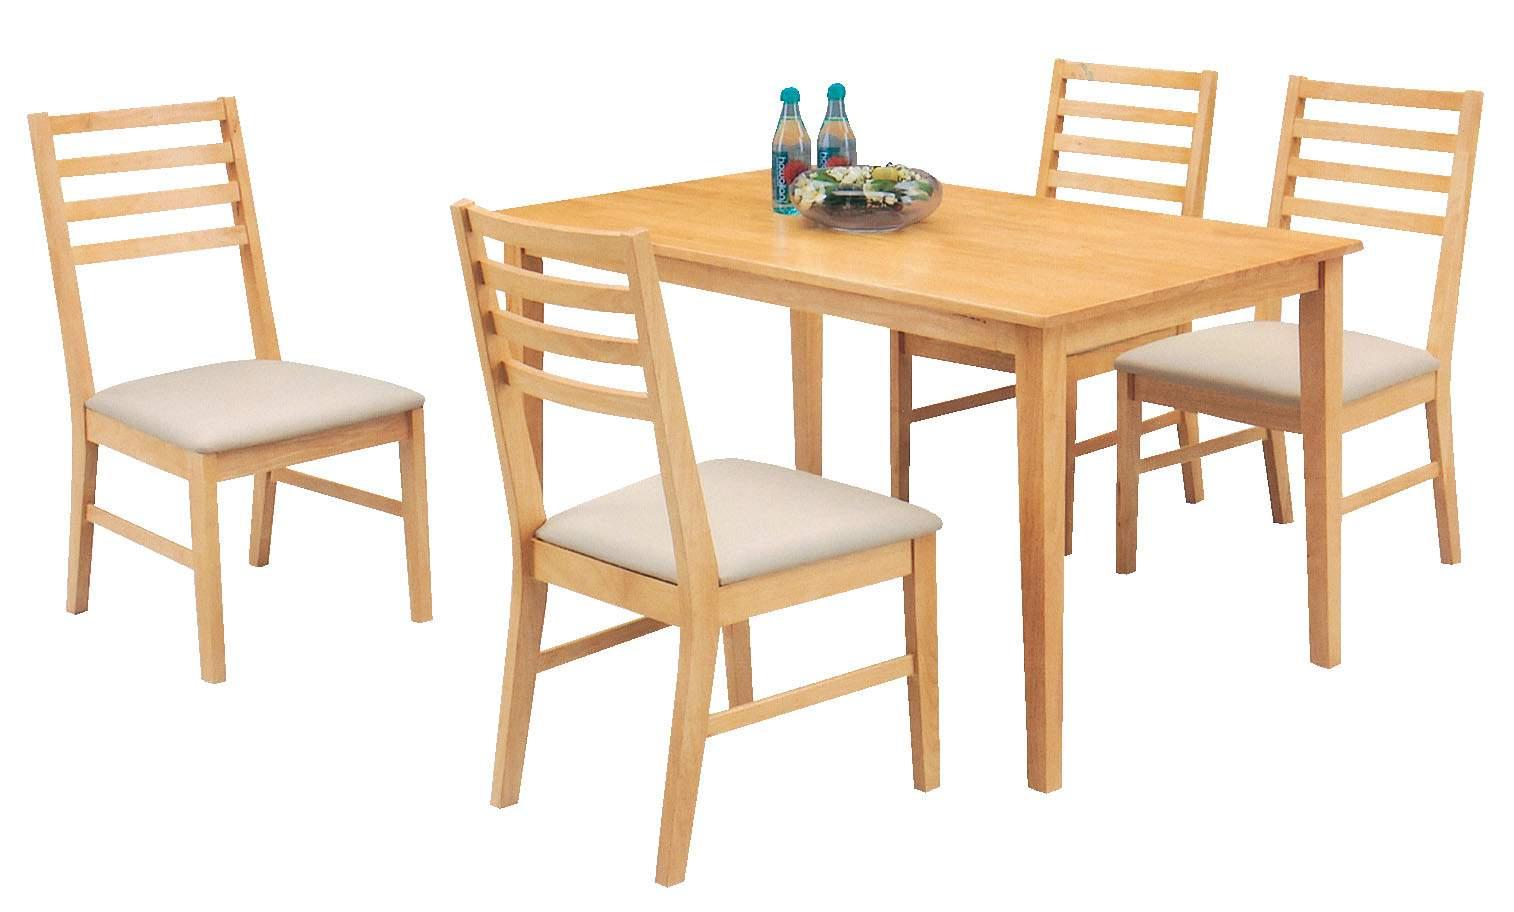 Mẫu bàn ăn gỗ cao su – TC13111